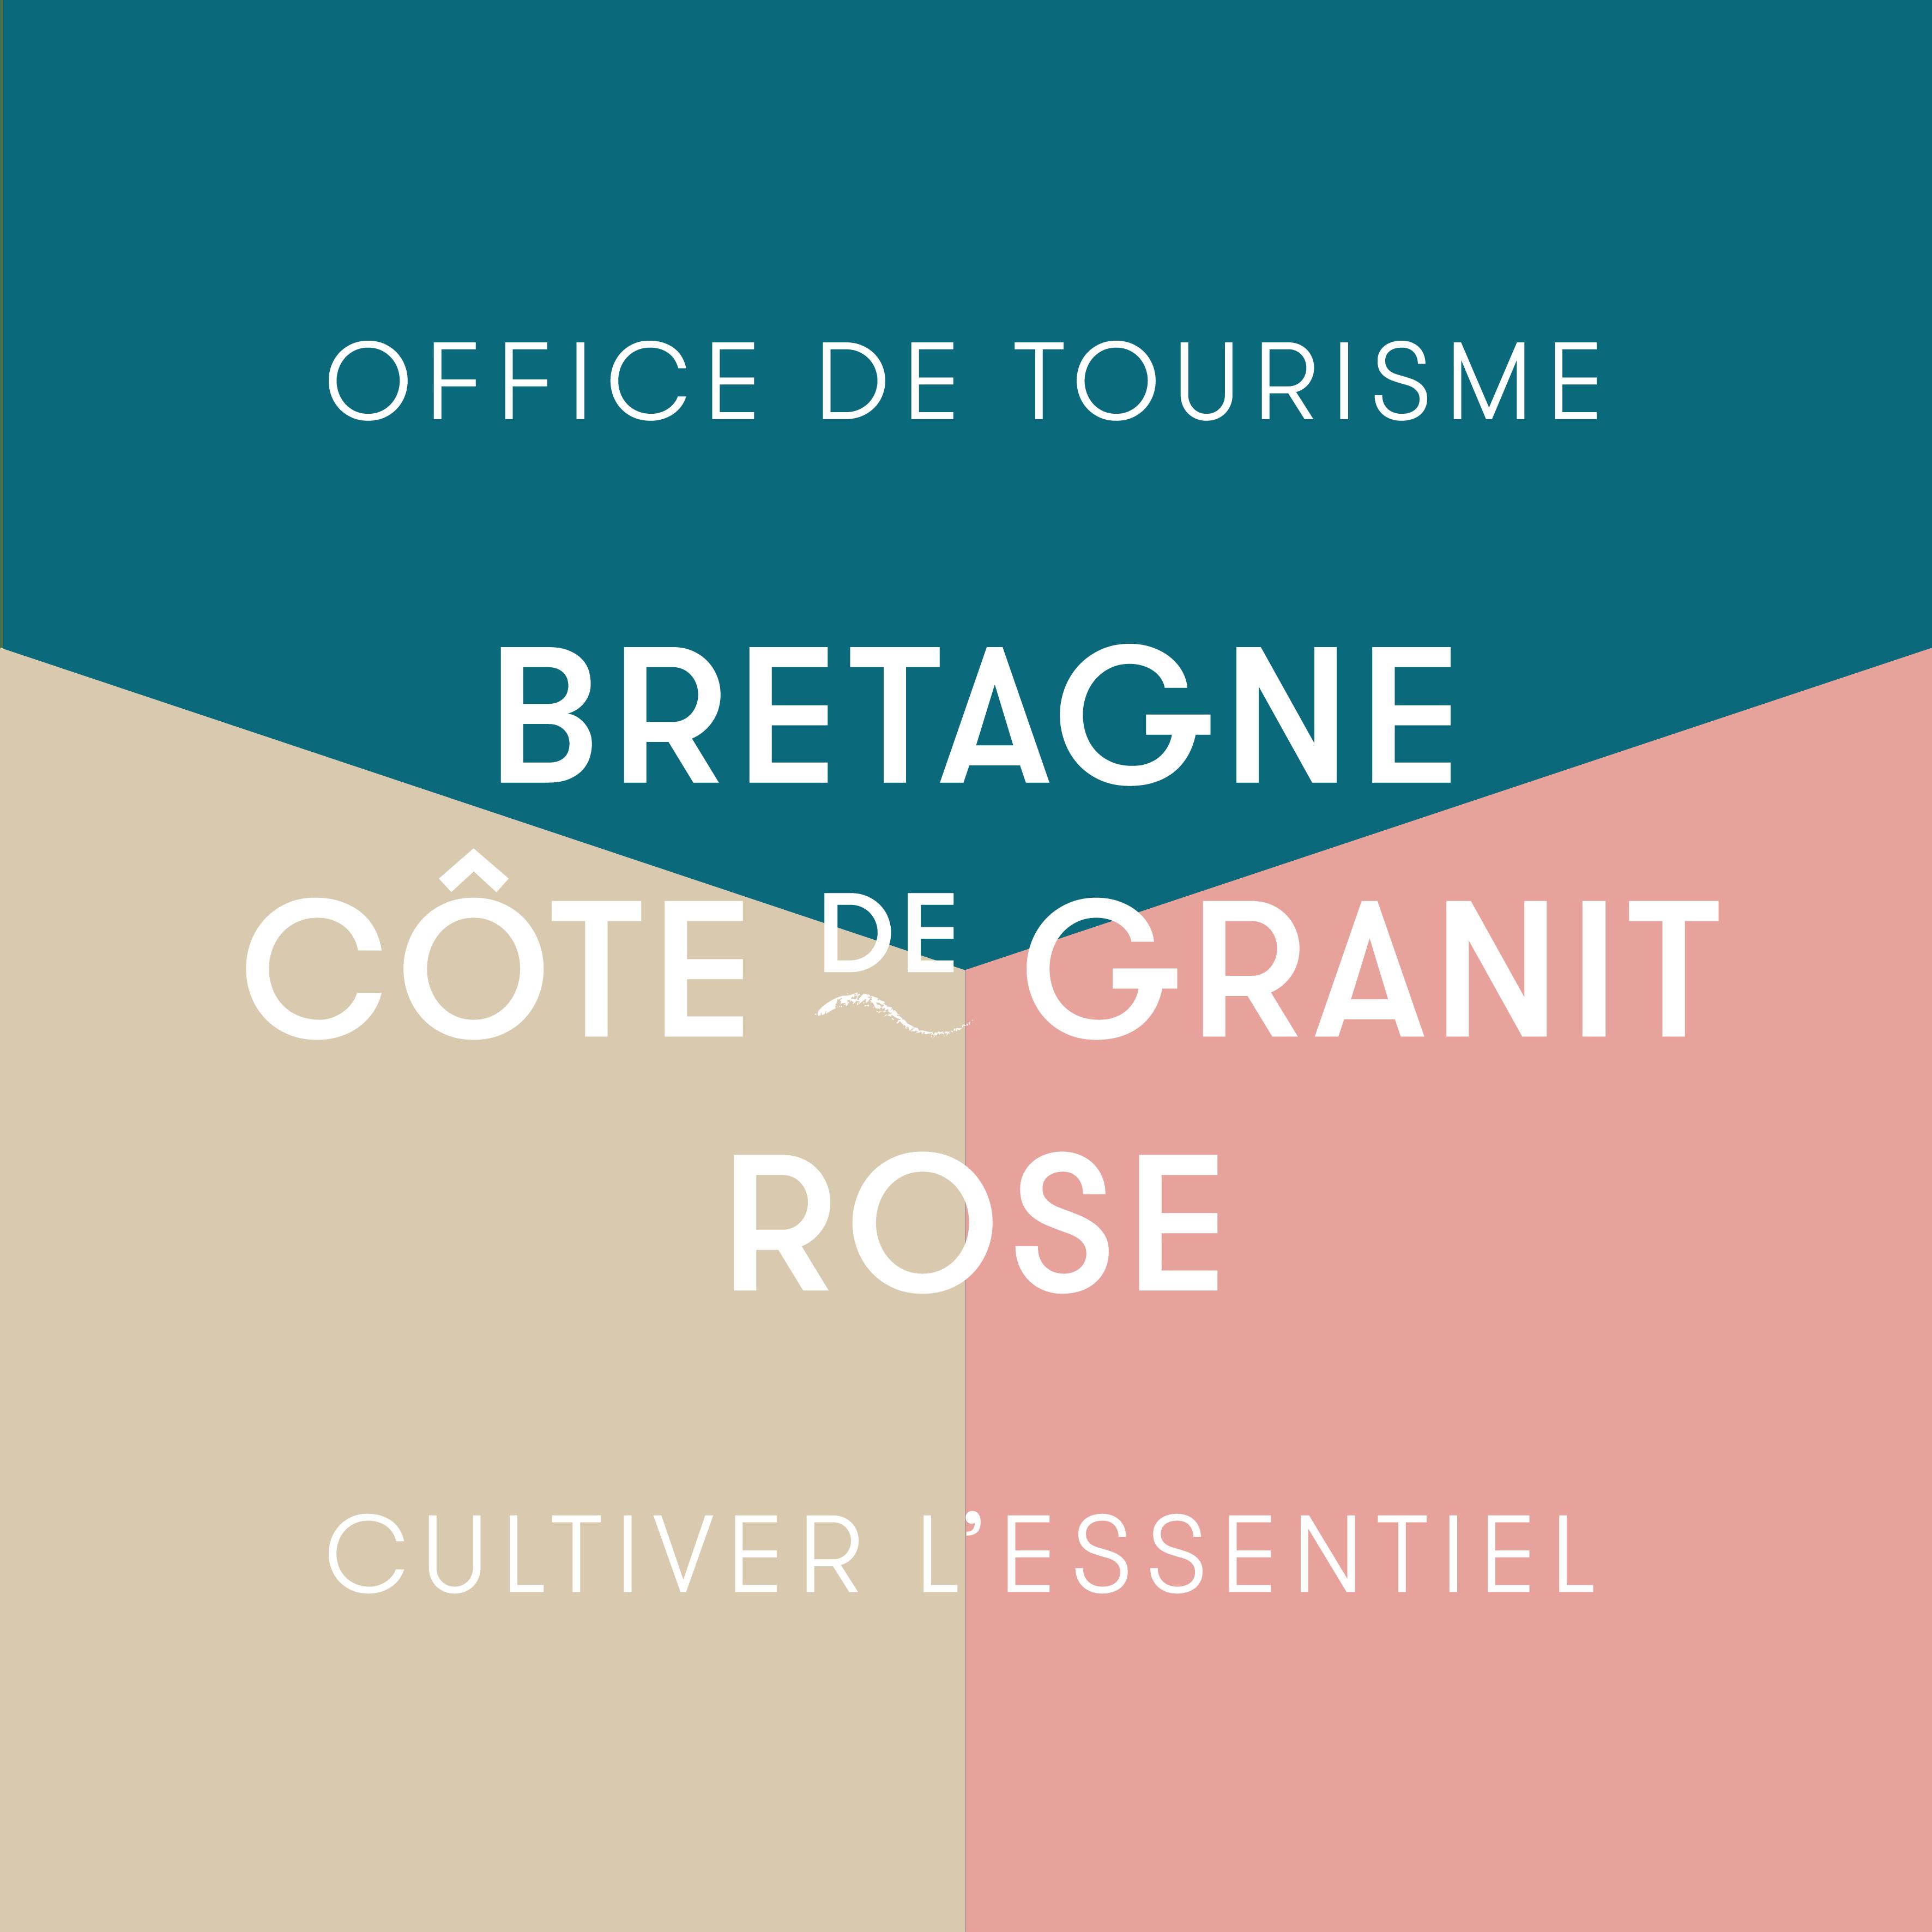 Bretagne Côte de Granit Rose